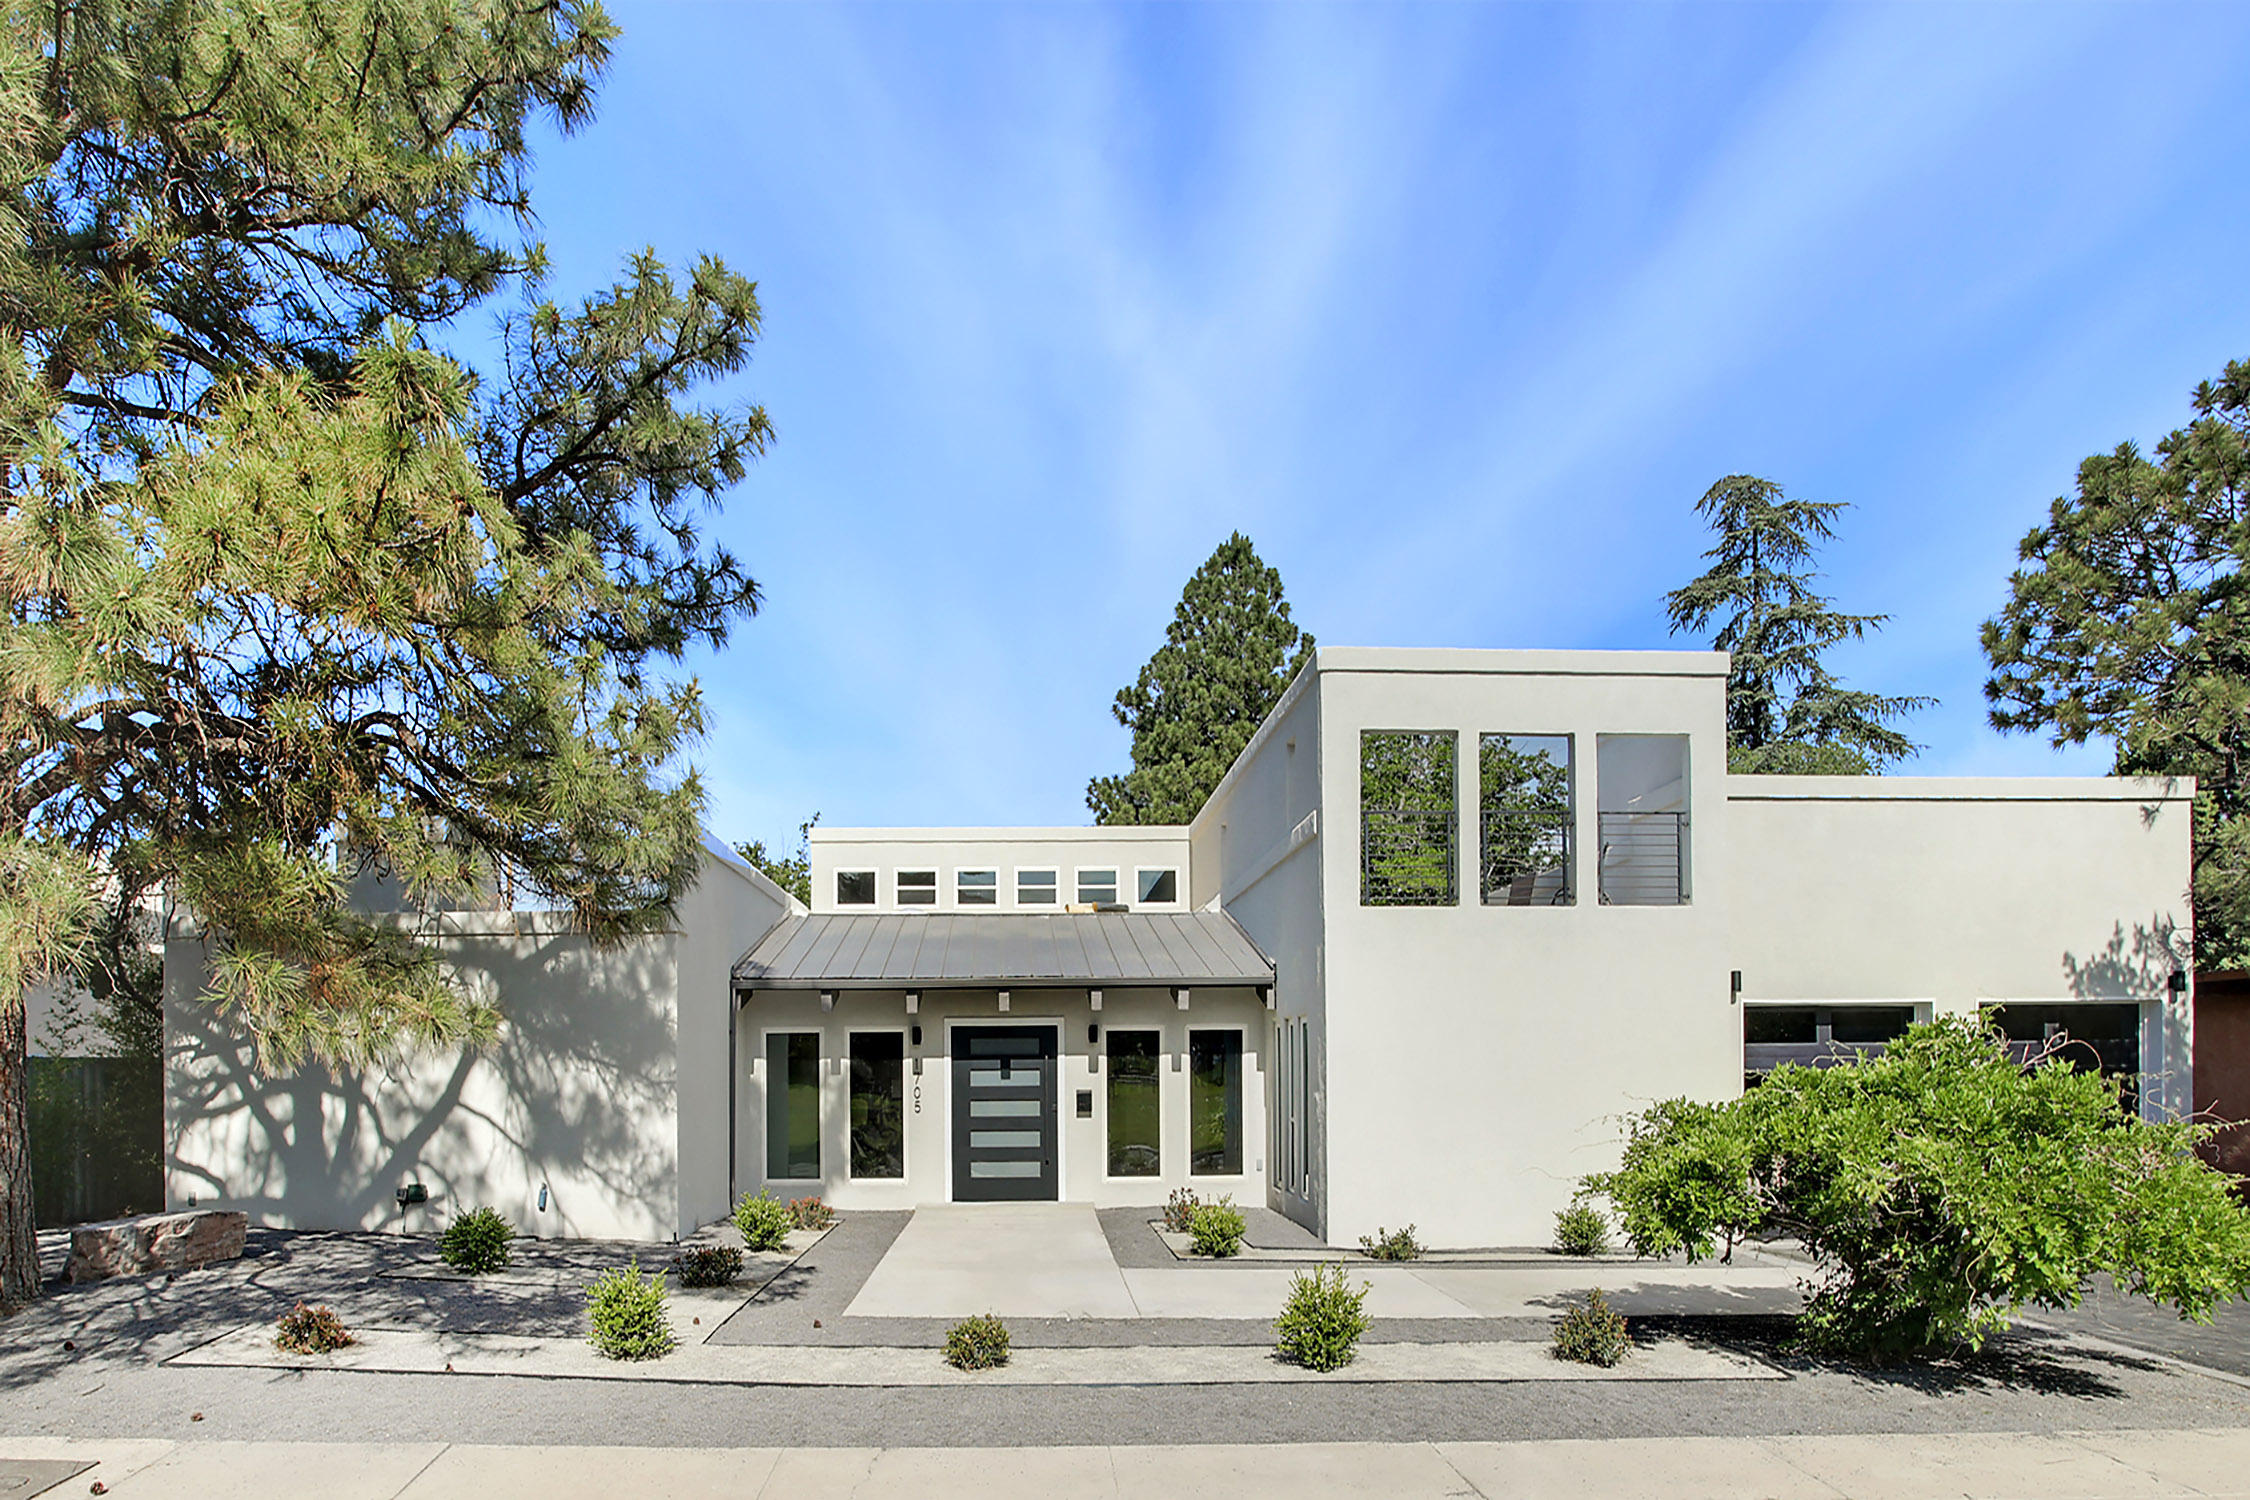 1705 MORNINGSIDE Drive NE, Albuquerque, NM 87110 - Albuquerque, NM real estate listing